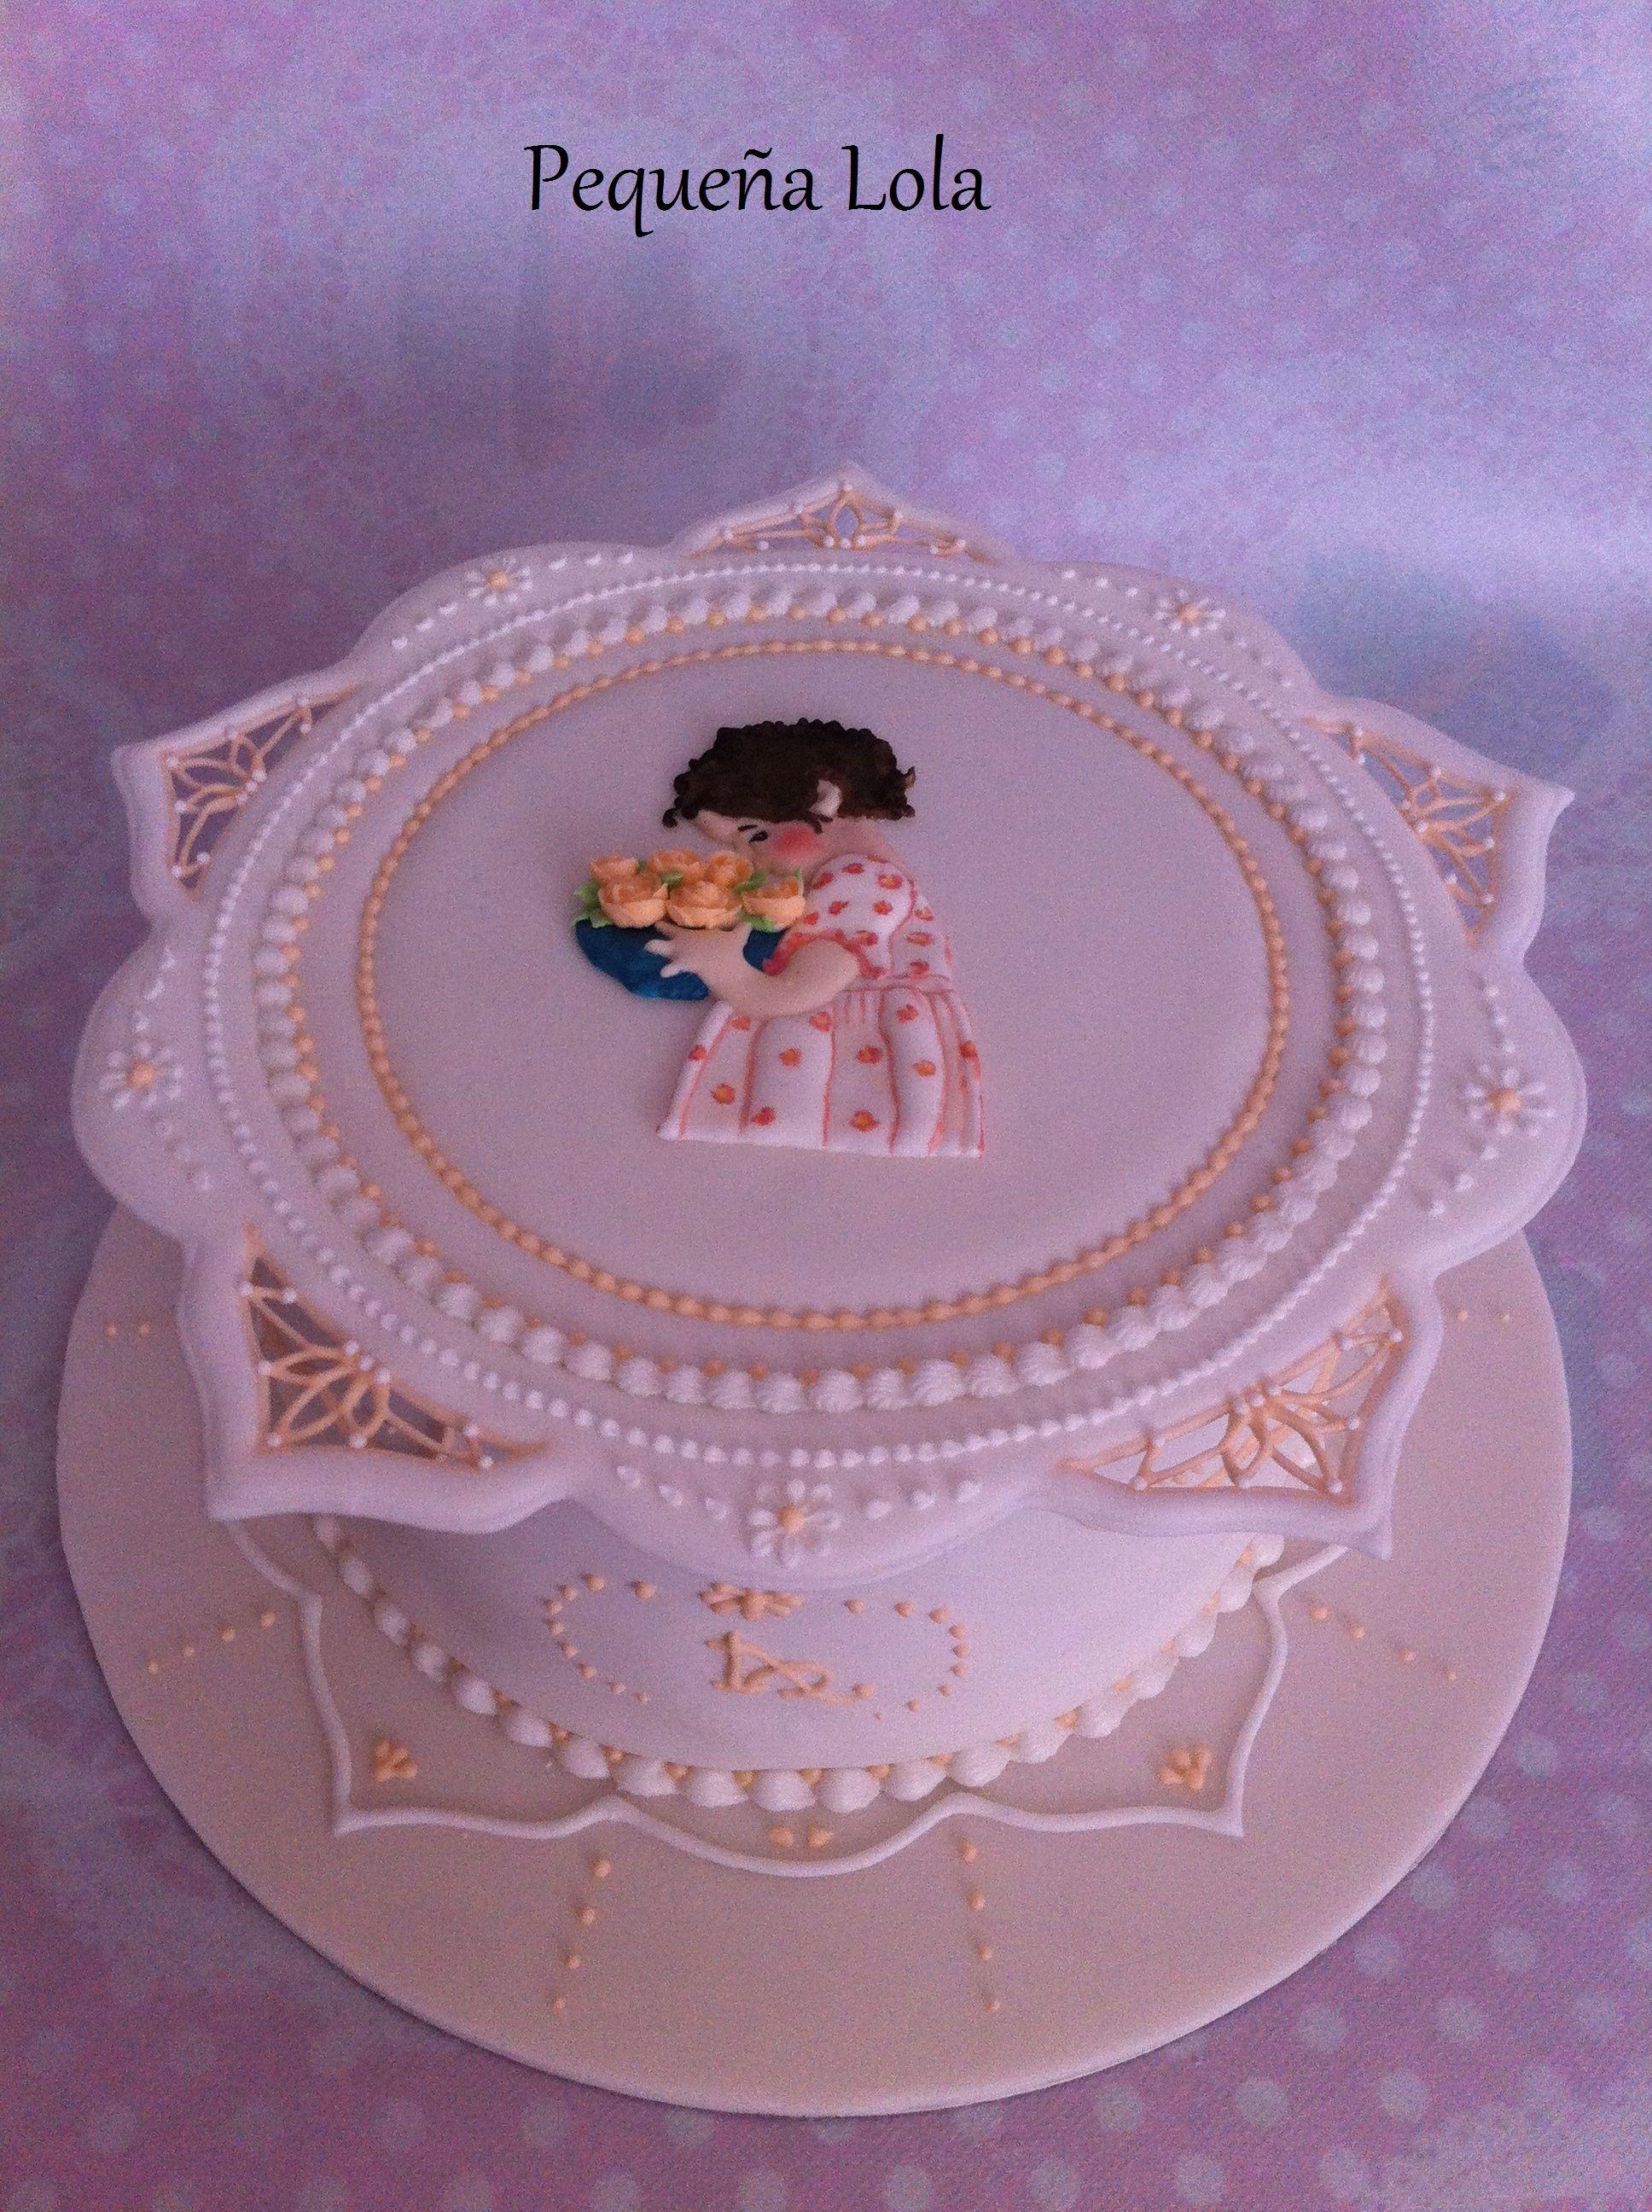 Royal icing collar cake for my grandma\'s 91st birthday Tarta collar ...